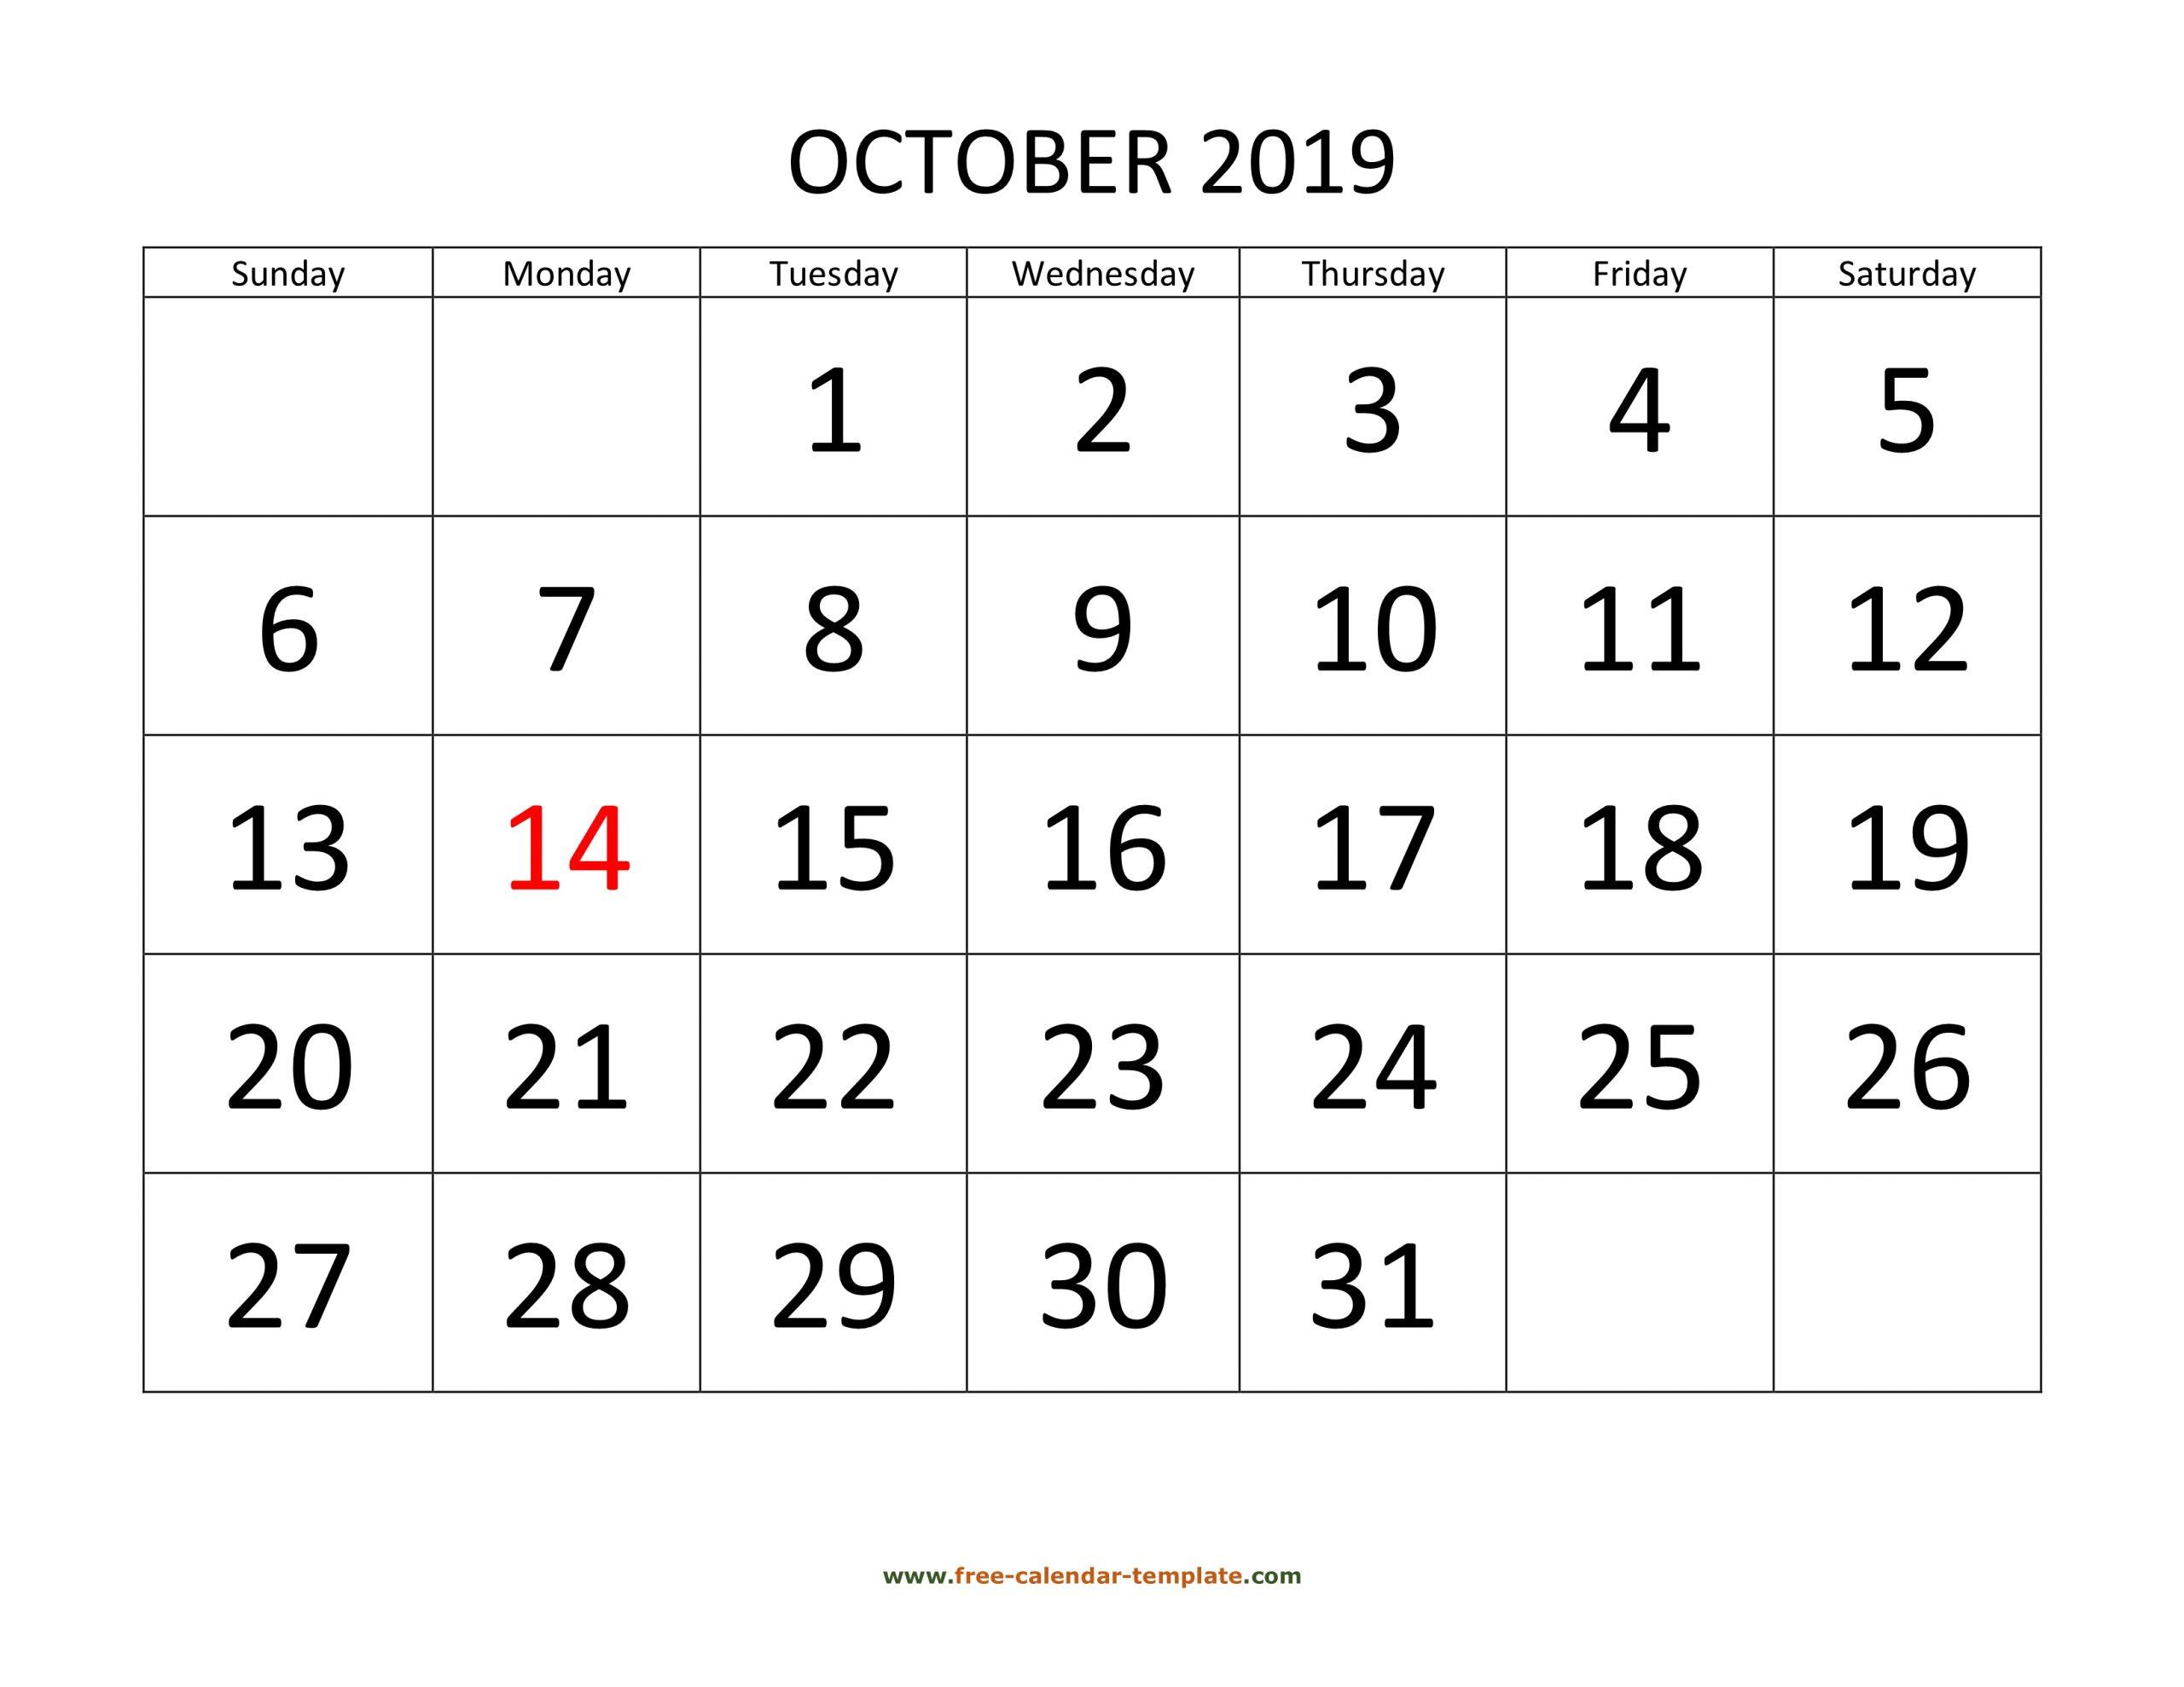 October 2019 Calendar Designed With Large Font (Horizontal